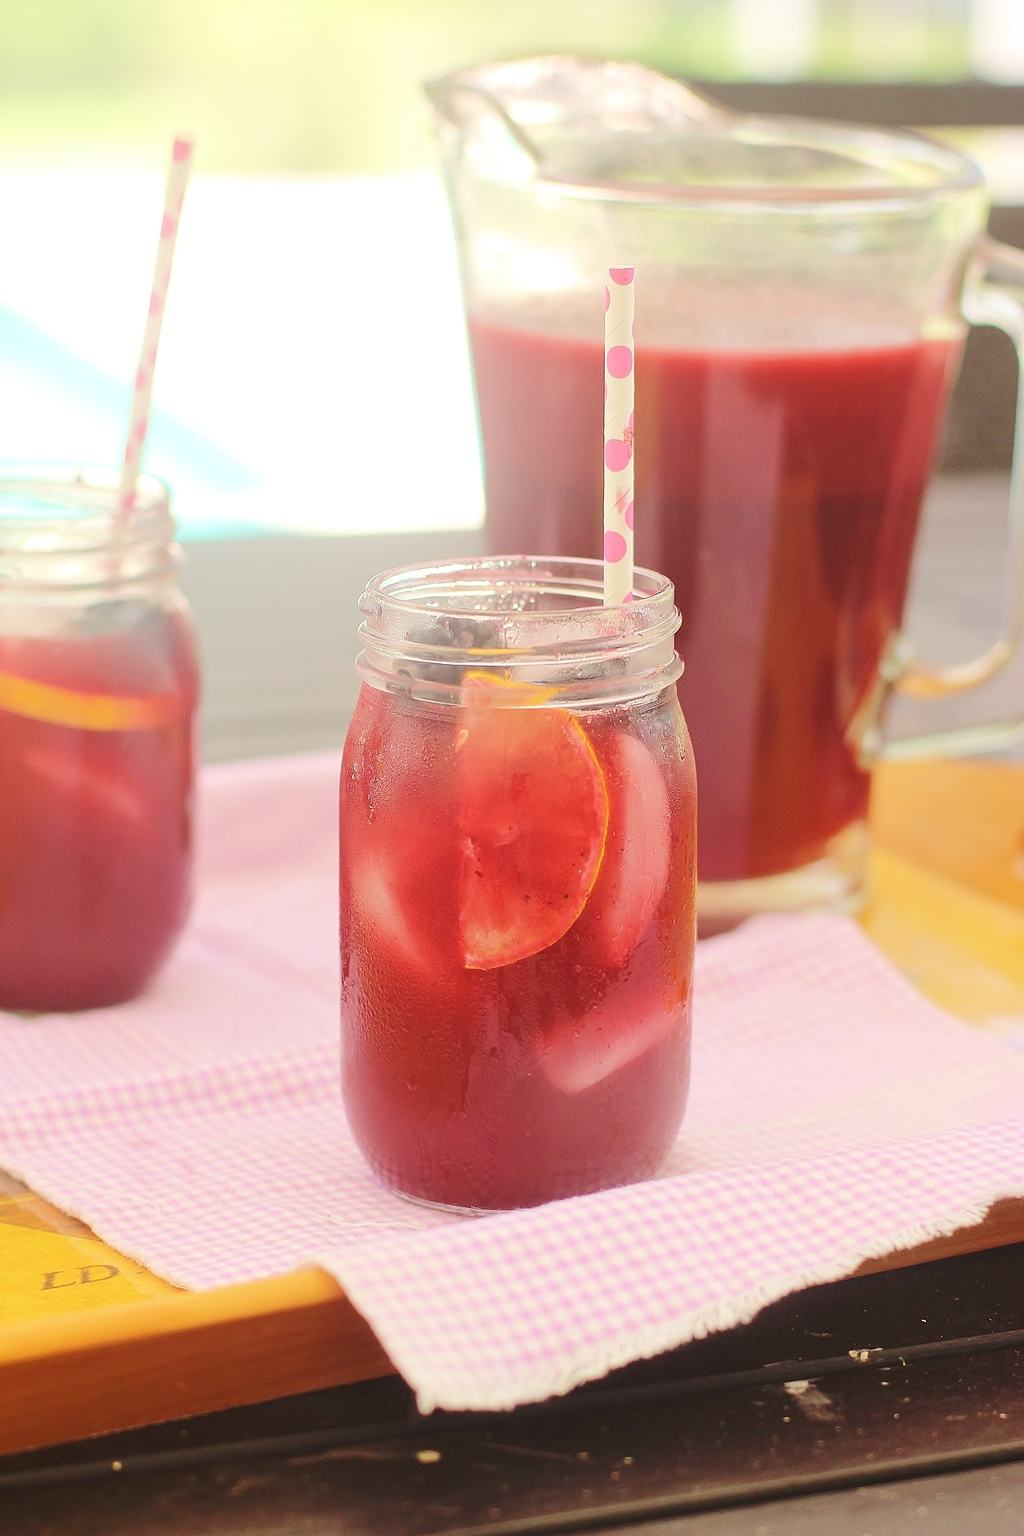 Triple Berry Southern Sweet Ice Tea